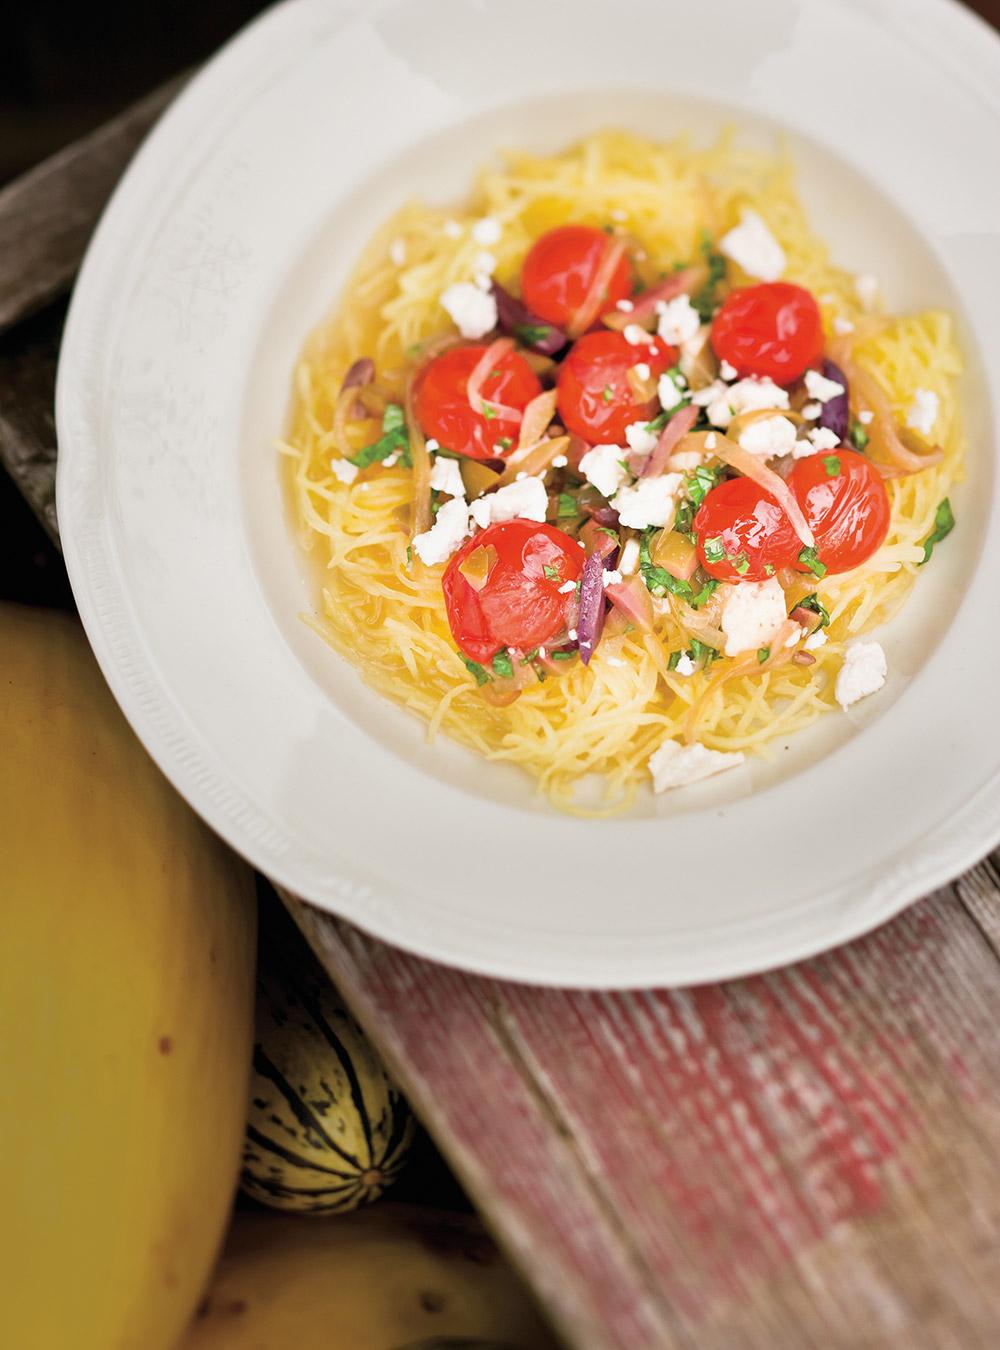 Courge spaghetti aux oignons, aux tomates et aux olives | ricardo